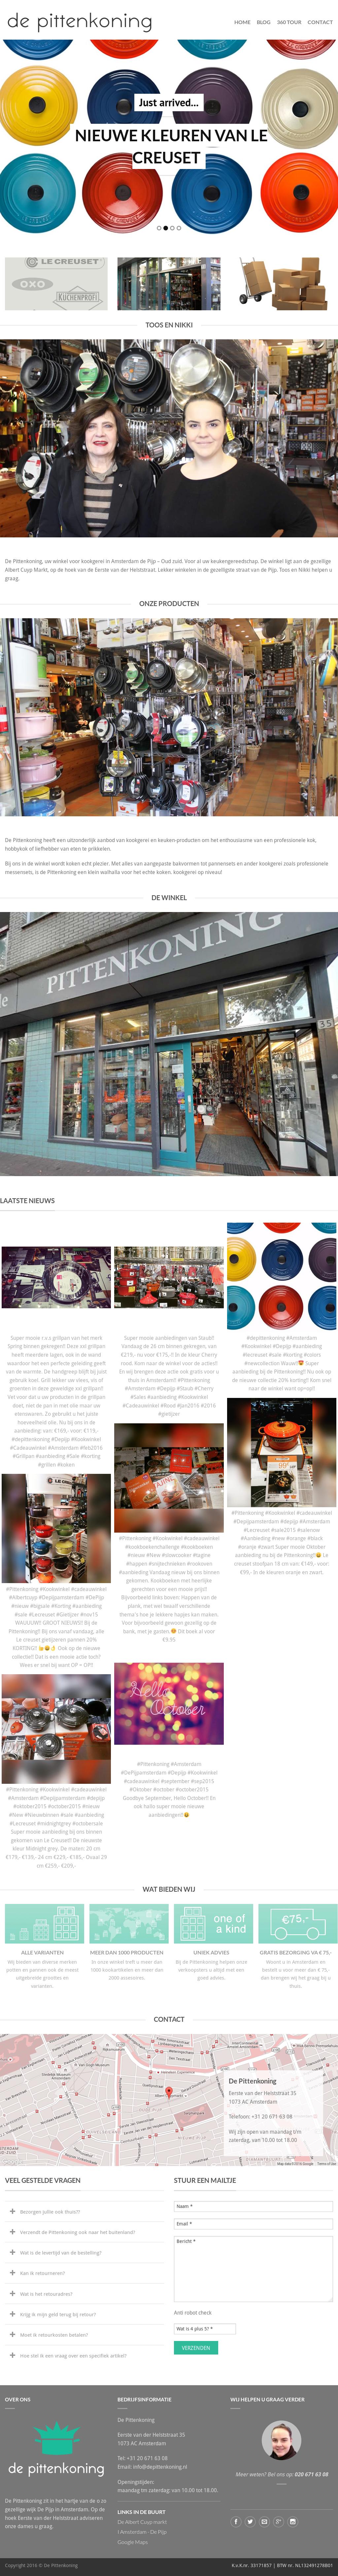 Design Bank Oranje.De Pittenkoning Competitors Revenue And Employees Owler Company